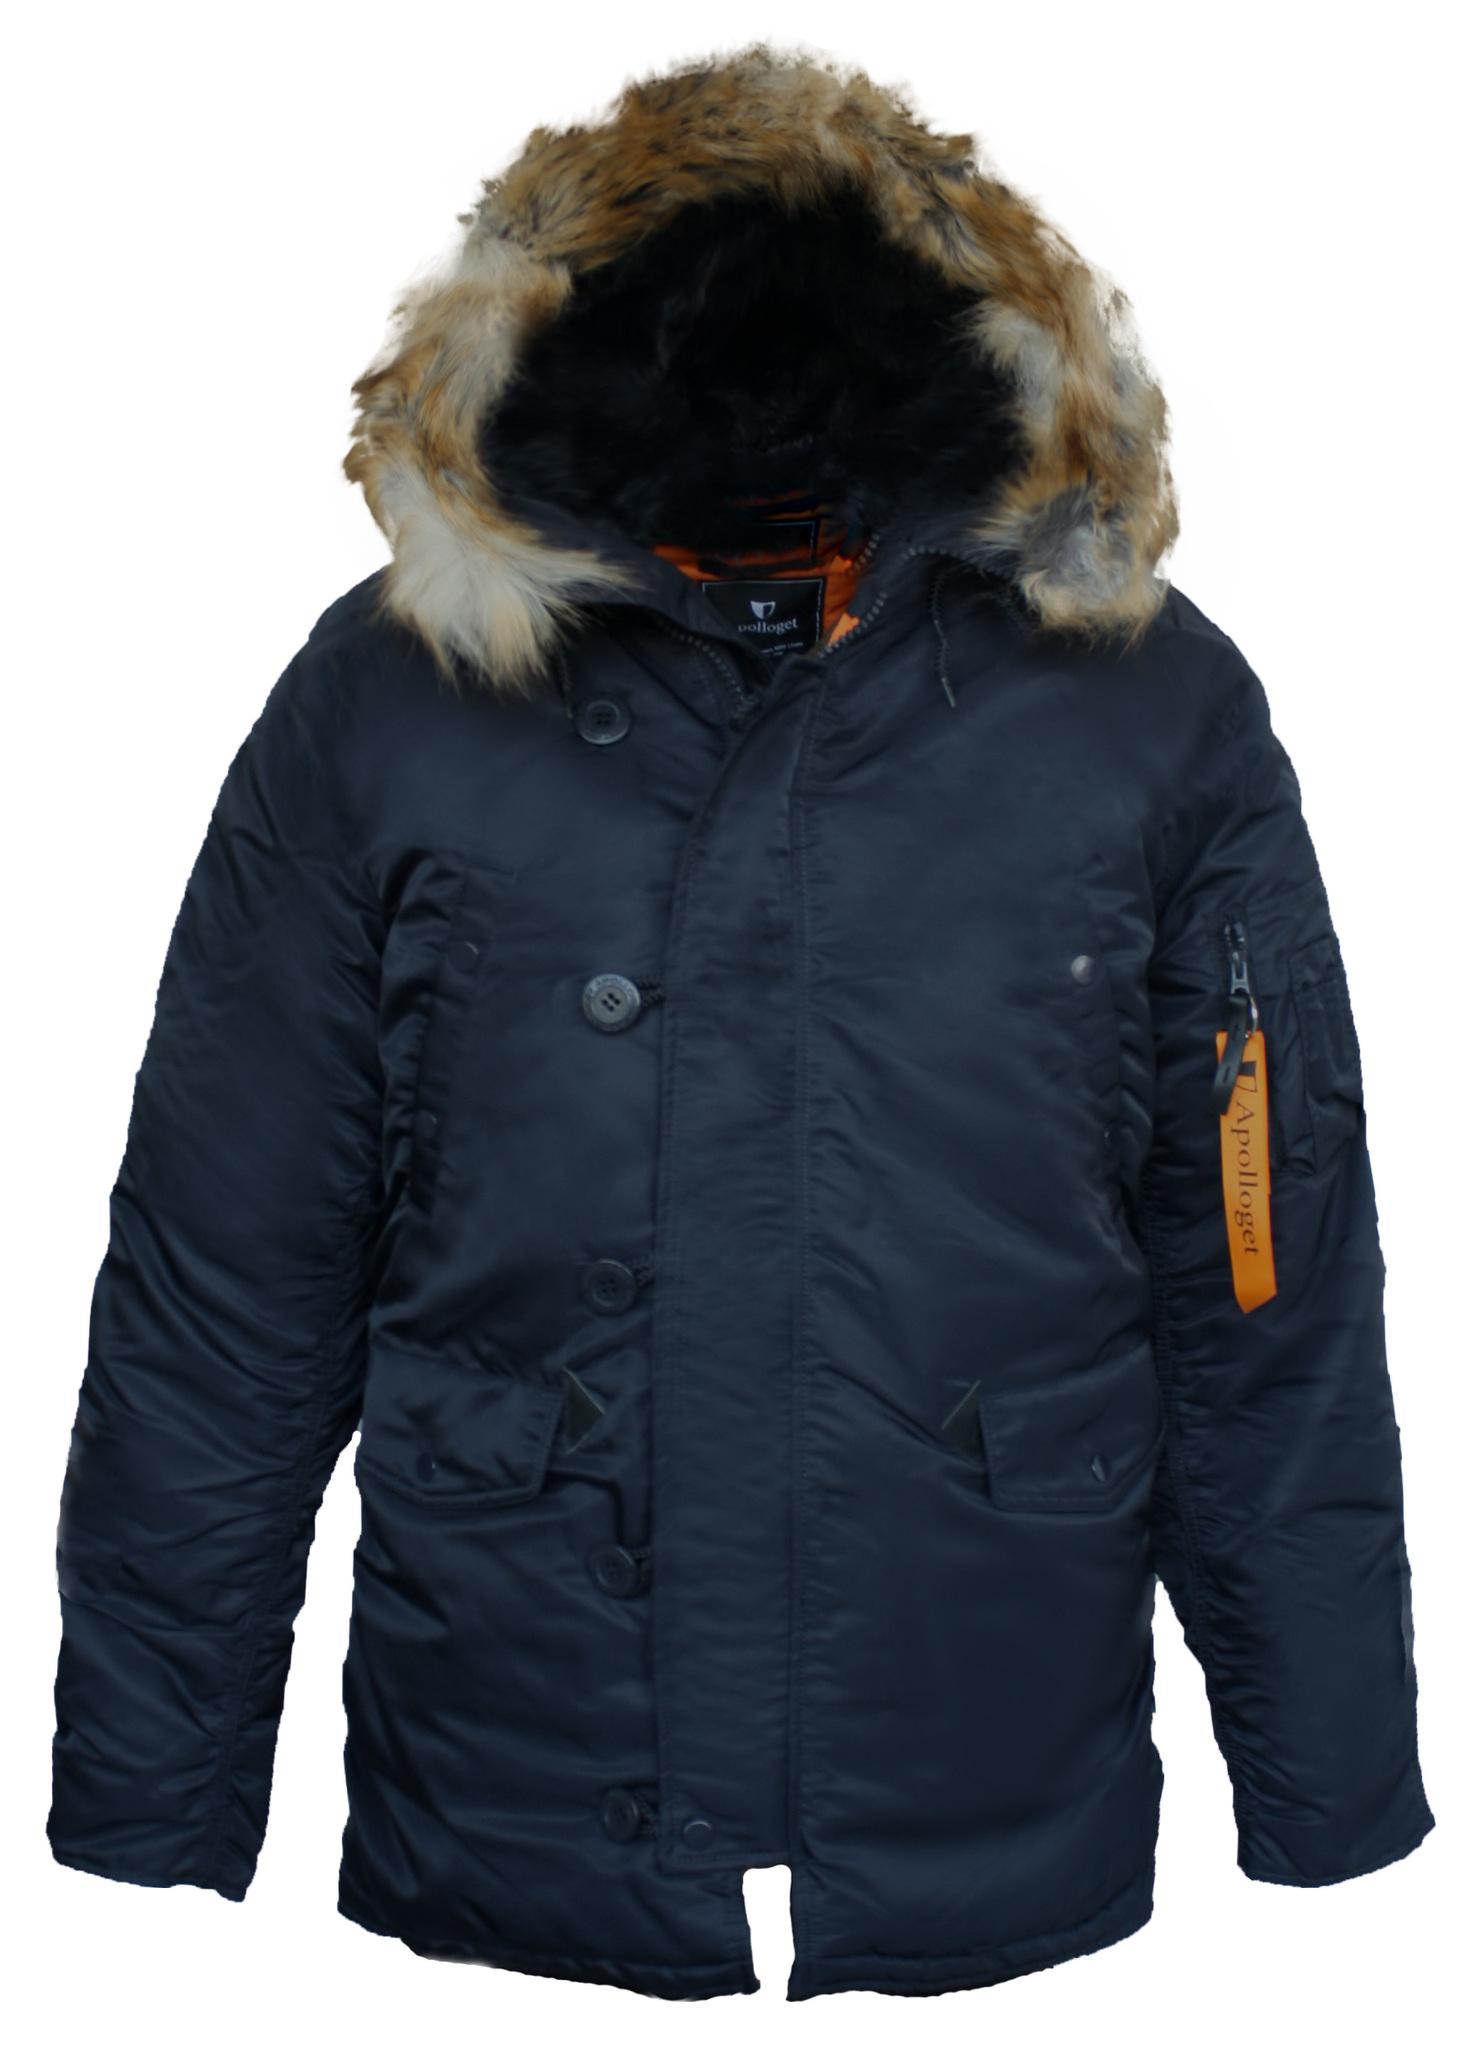 Куртка Аляска  N-3B  Husky Apolloget 2017 (т. синий - ink/orange)